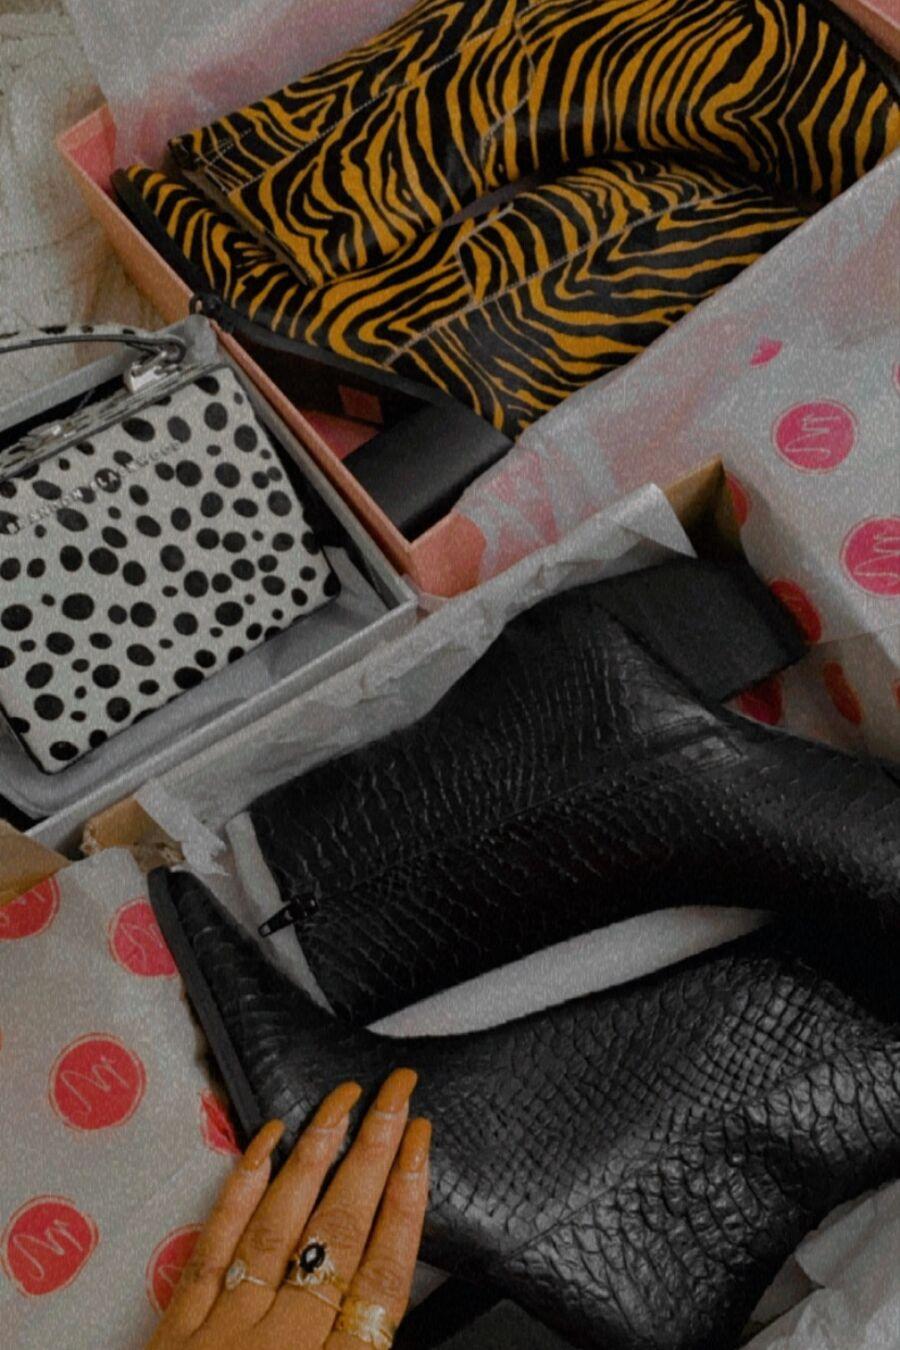 Matisse Footwear Caty Ankle Boot - black snake